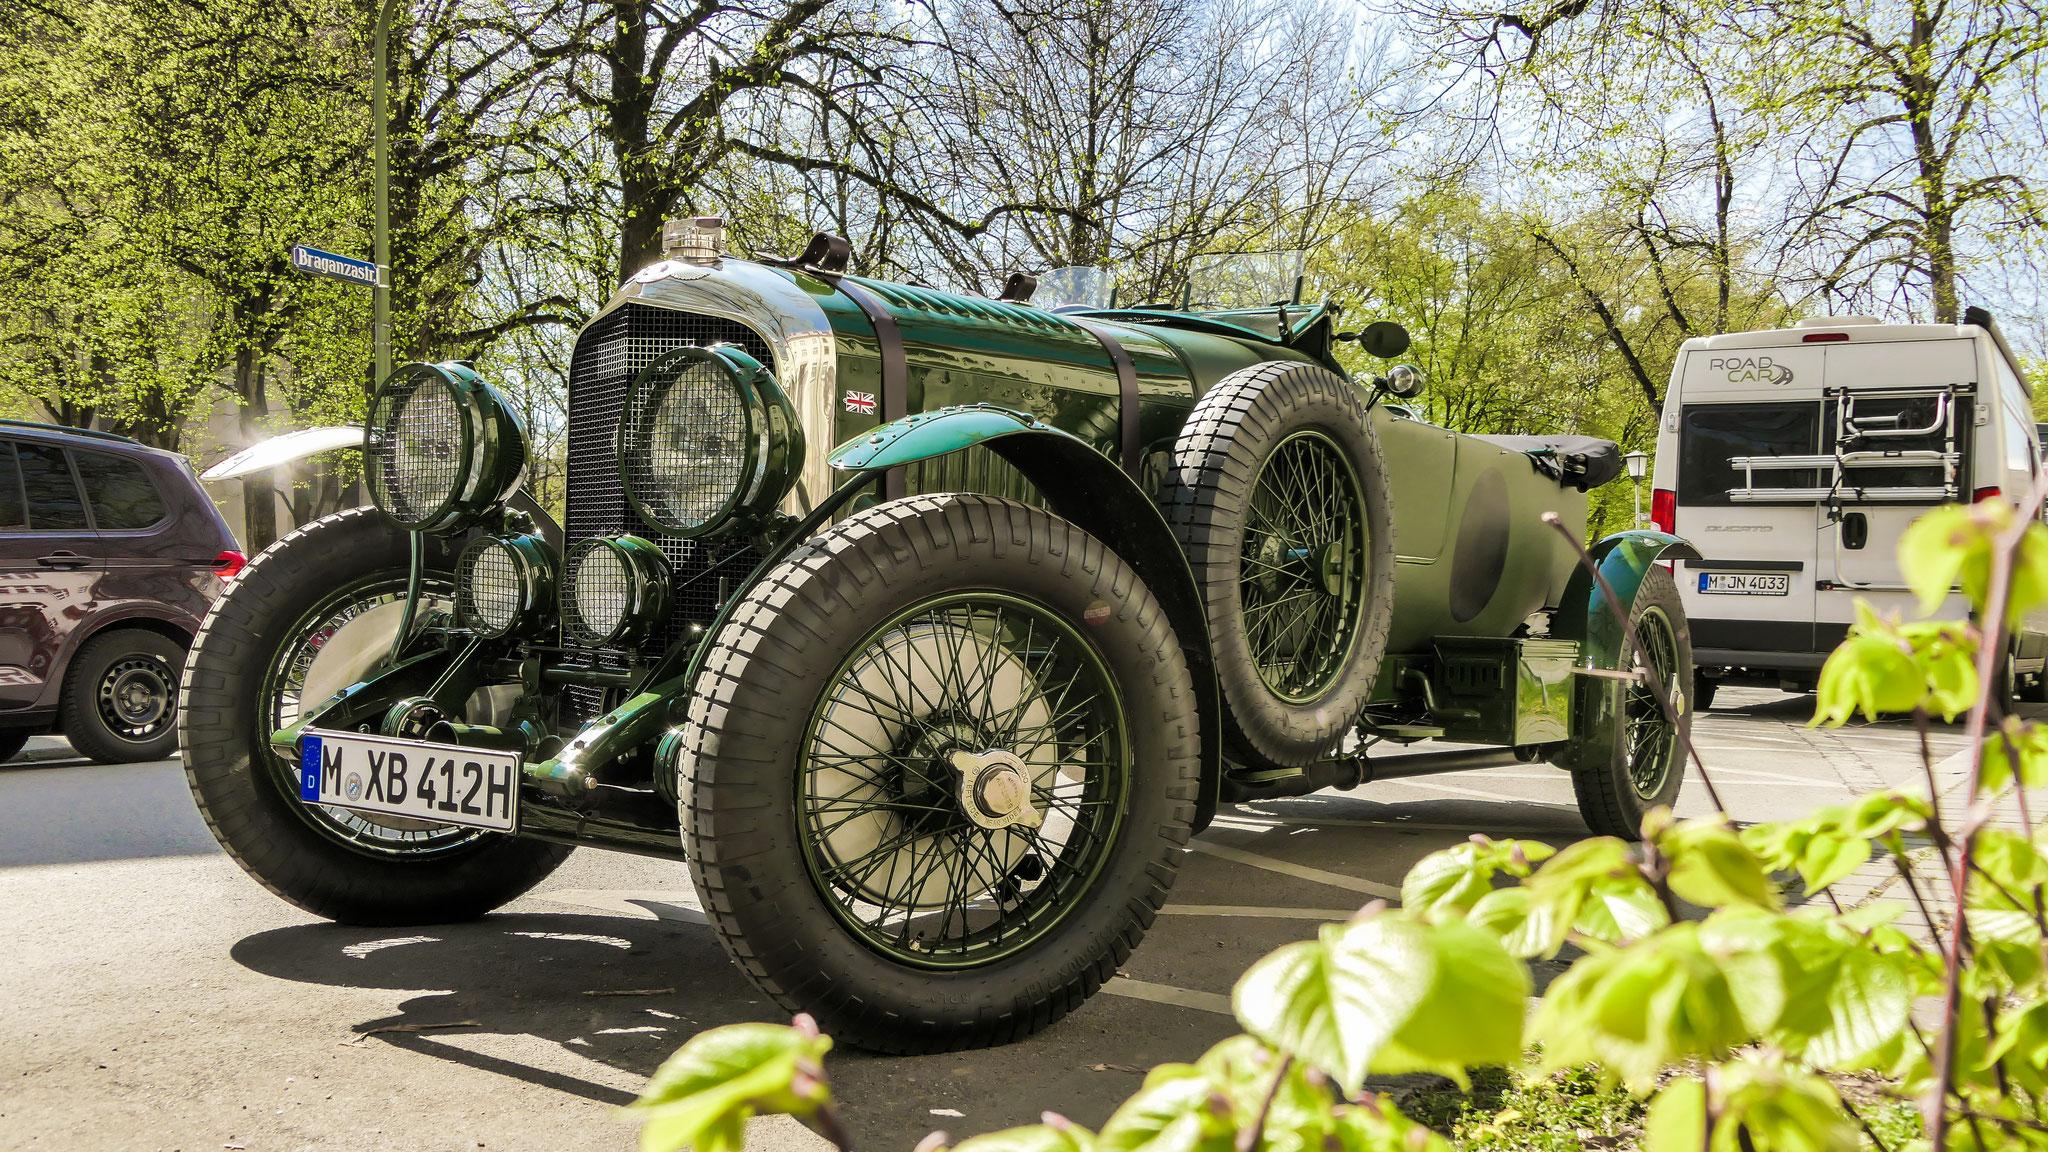 Bentley 4 1/2 Litre - M-XB-412H